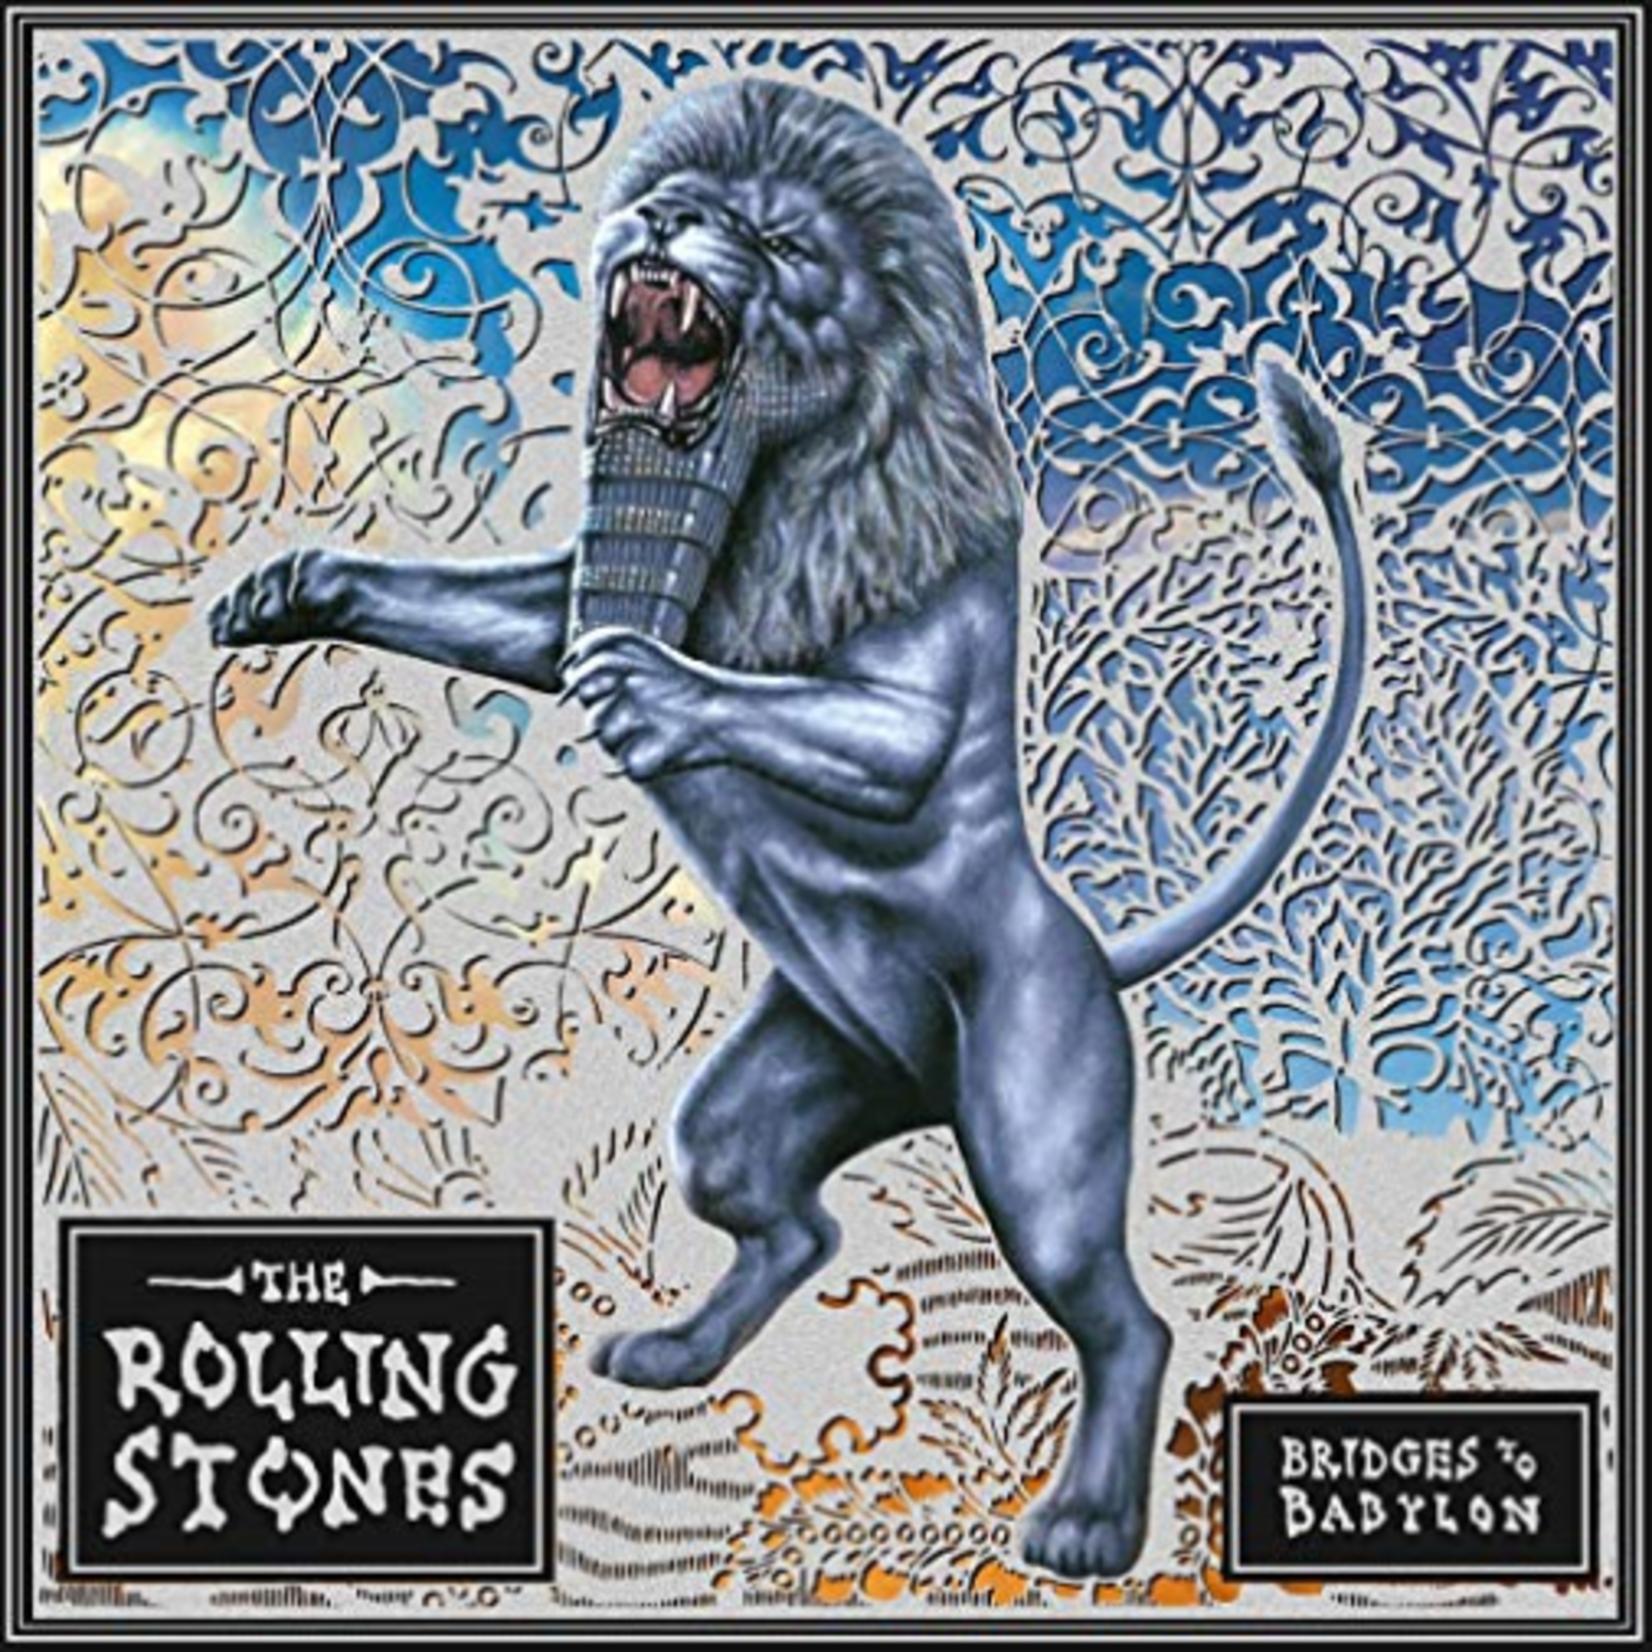 ROLLING STONES BRIDGES TO BABYLON (LP)